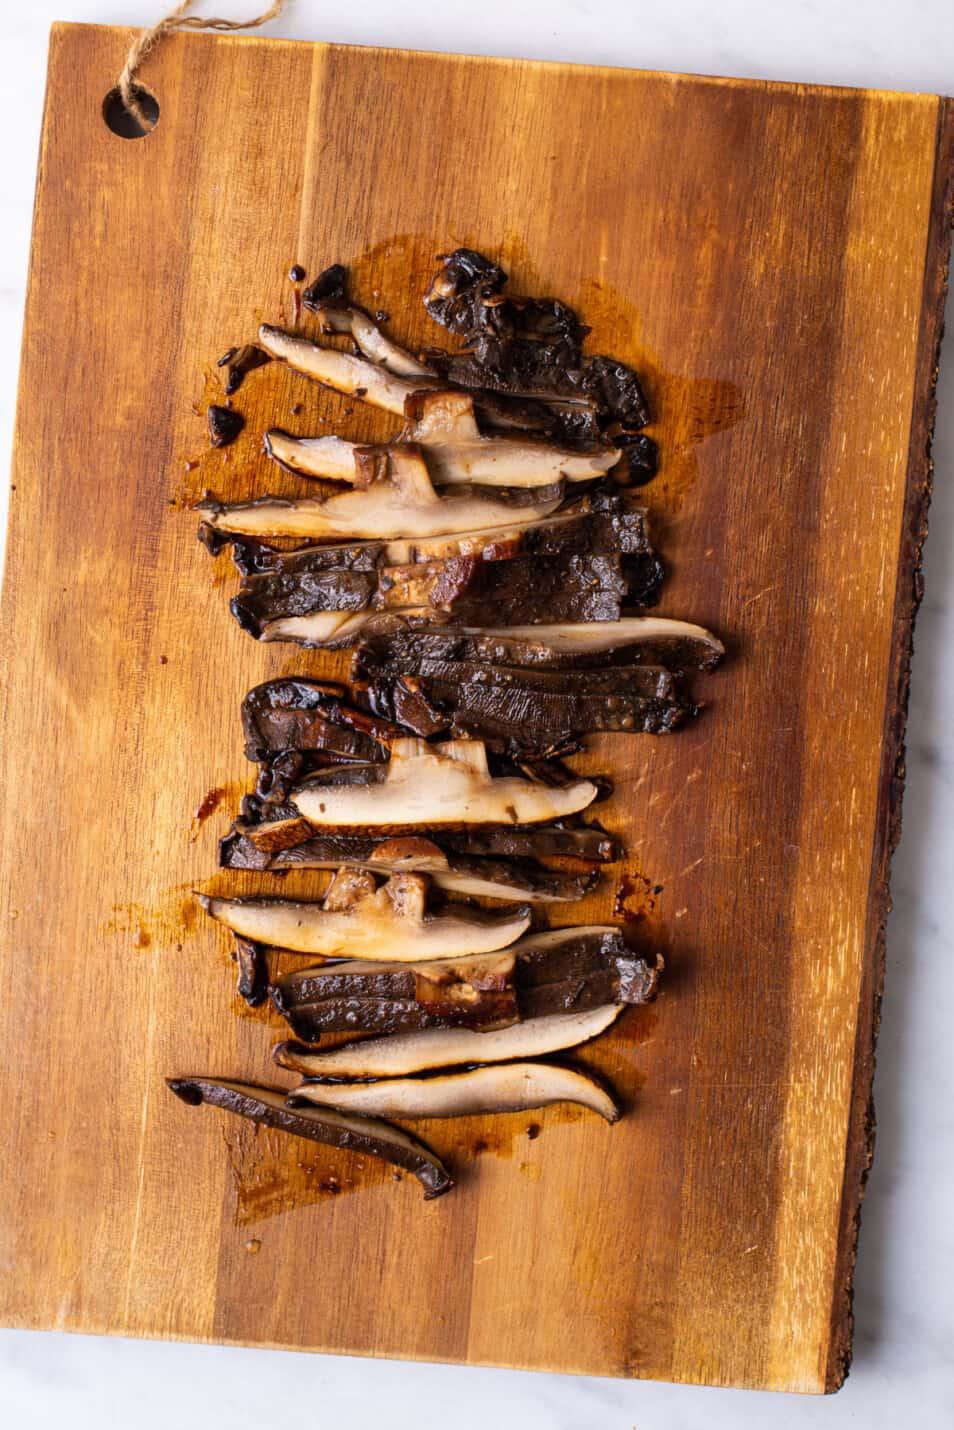 Sliced balsamic portobello mushrooms on a wooden board.